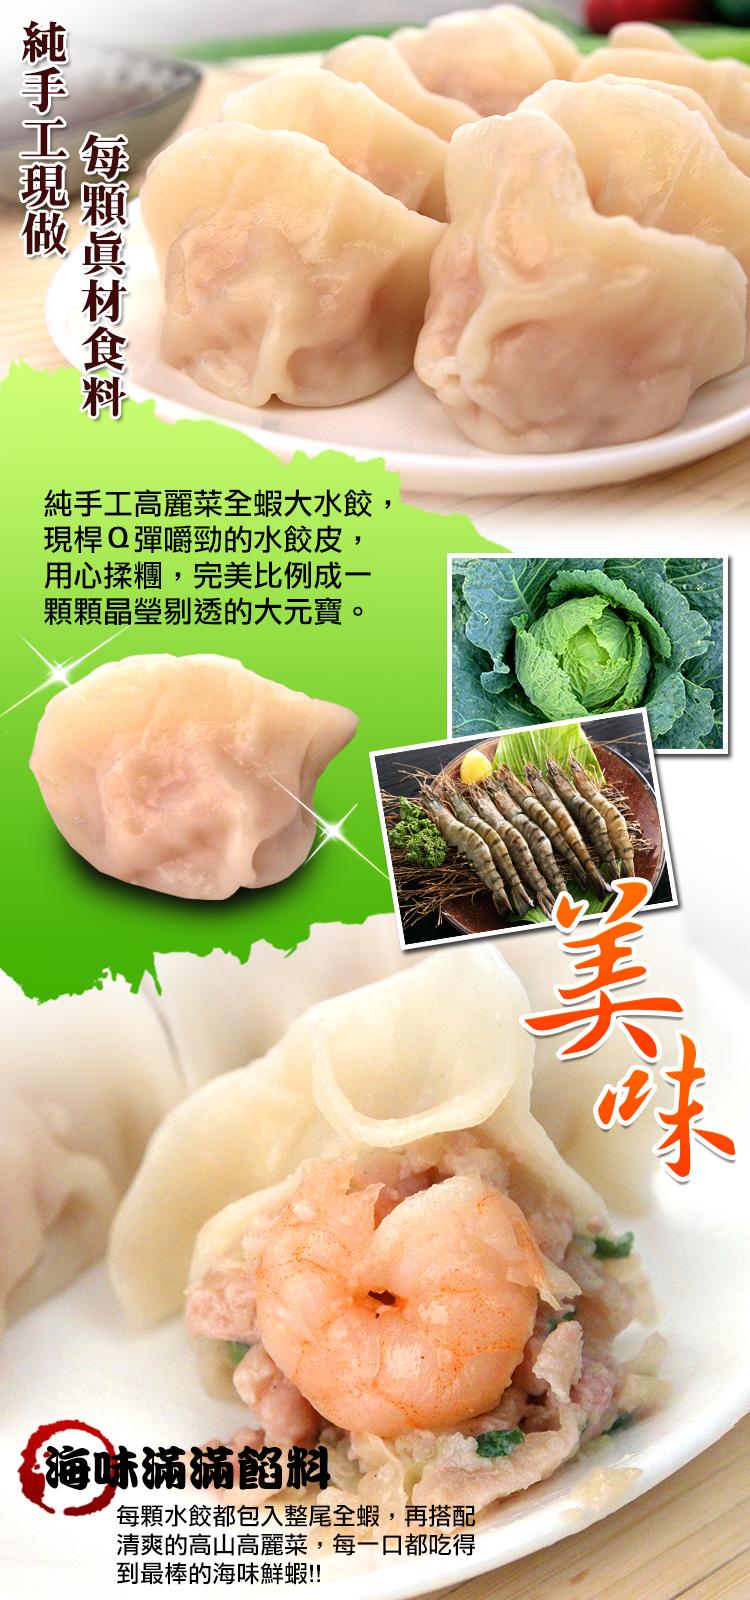 shrimpcabbage09